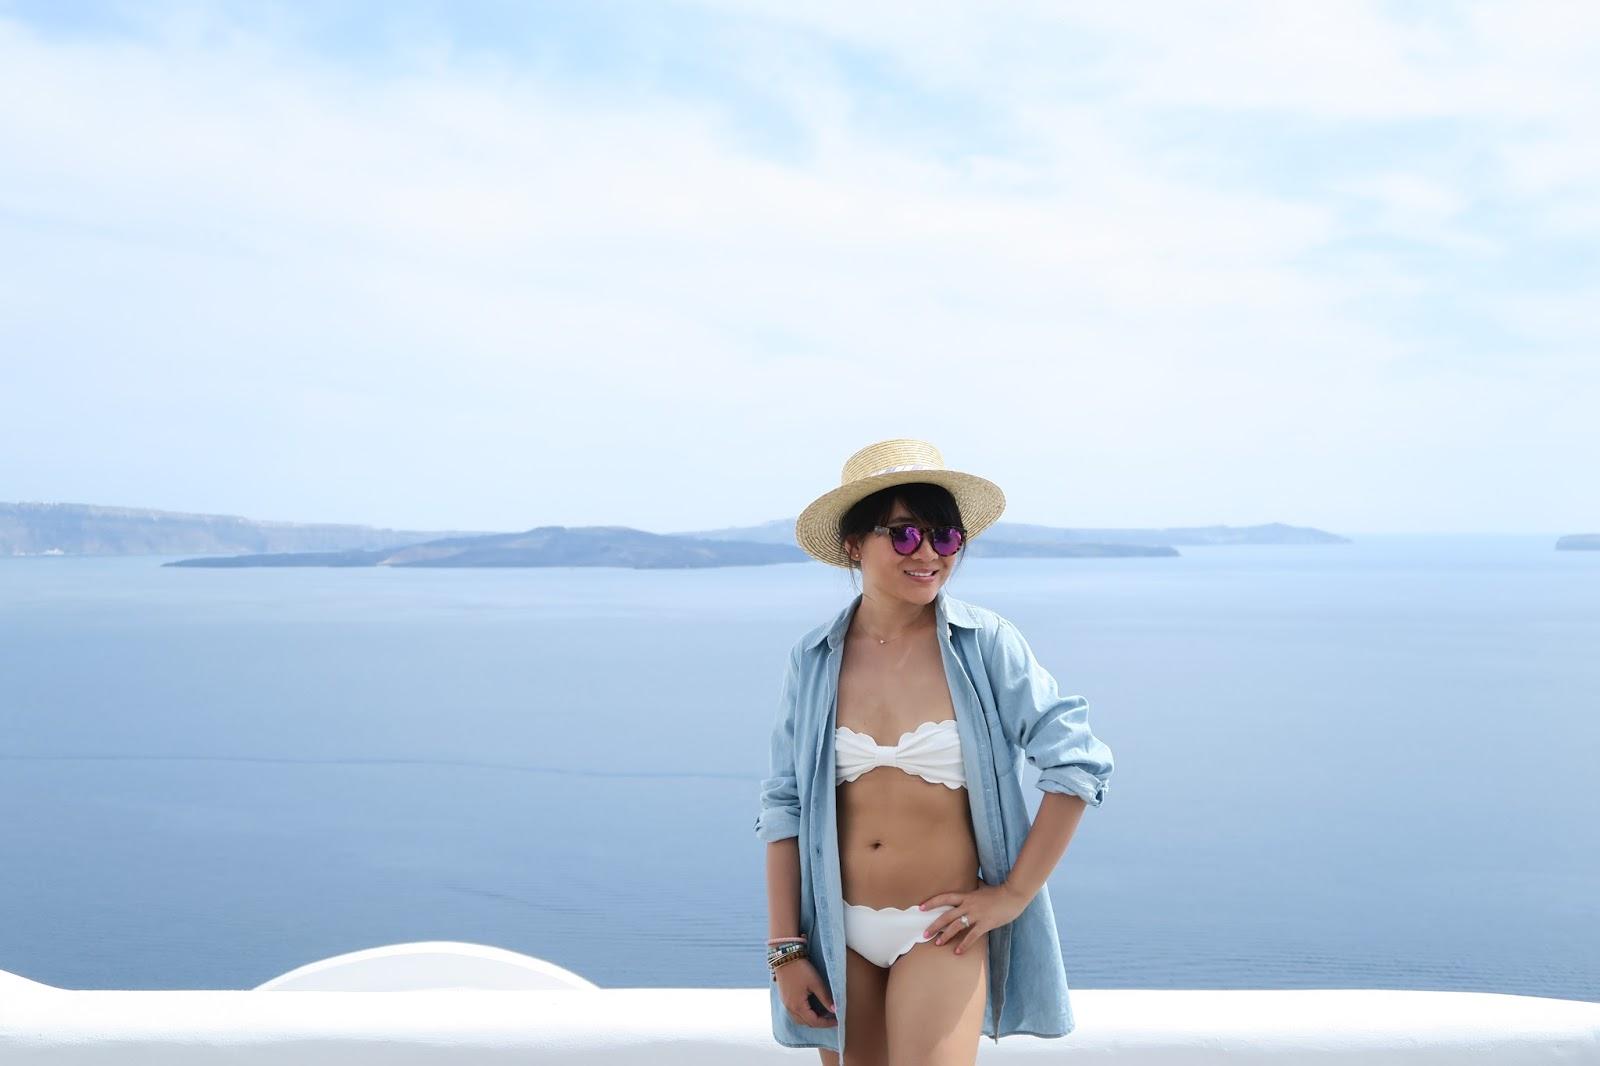 santorini greece outfit inspiration marysia swim